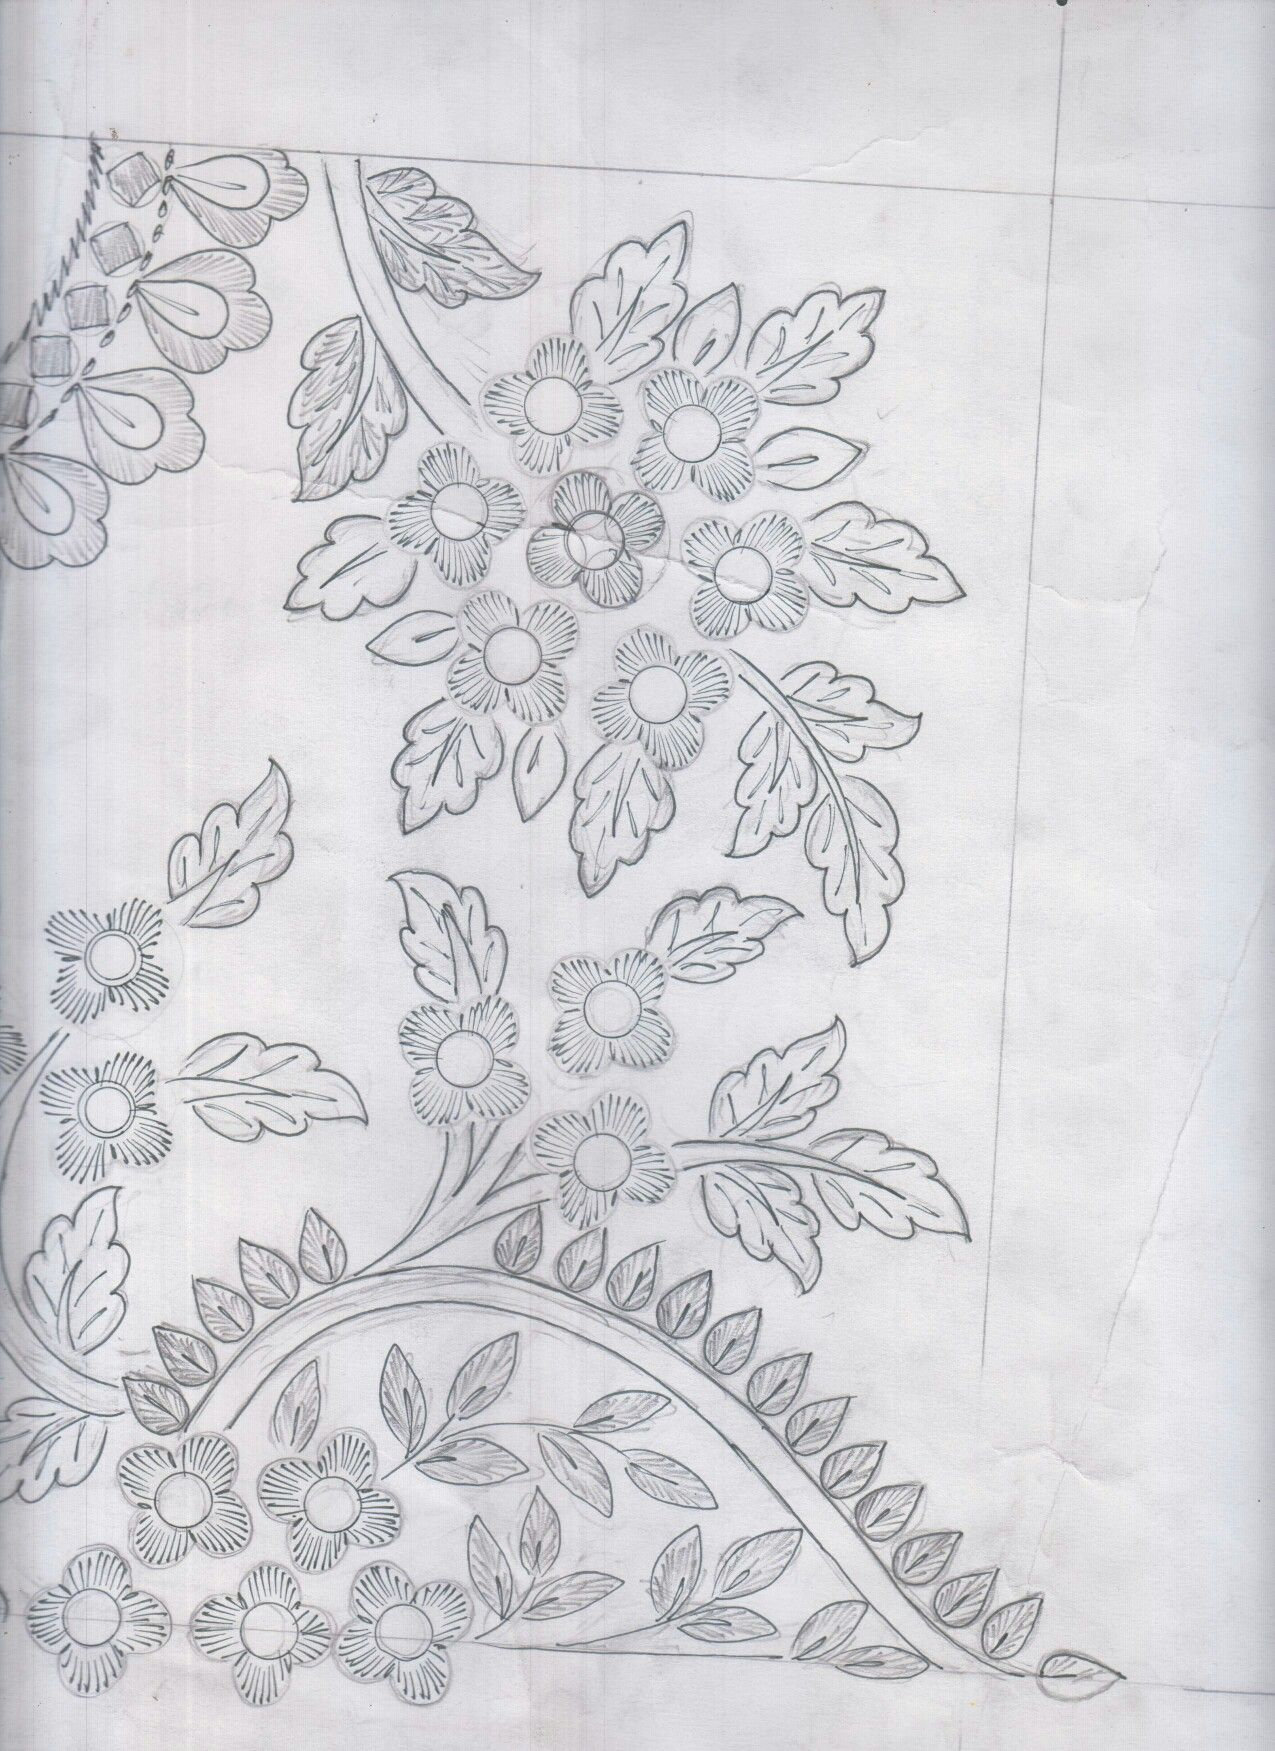 Pin by baldev gevariya on Design sketches | Embroidery ...